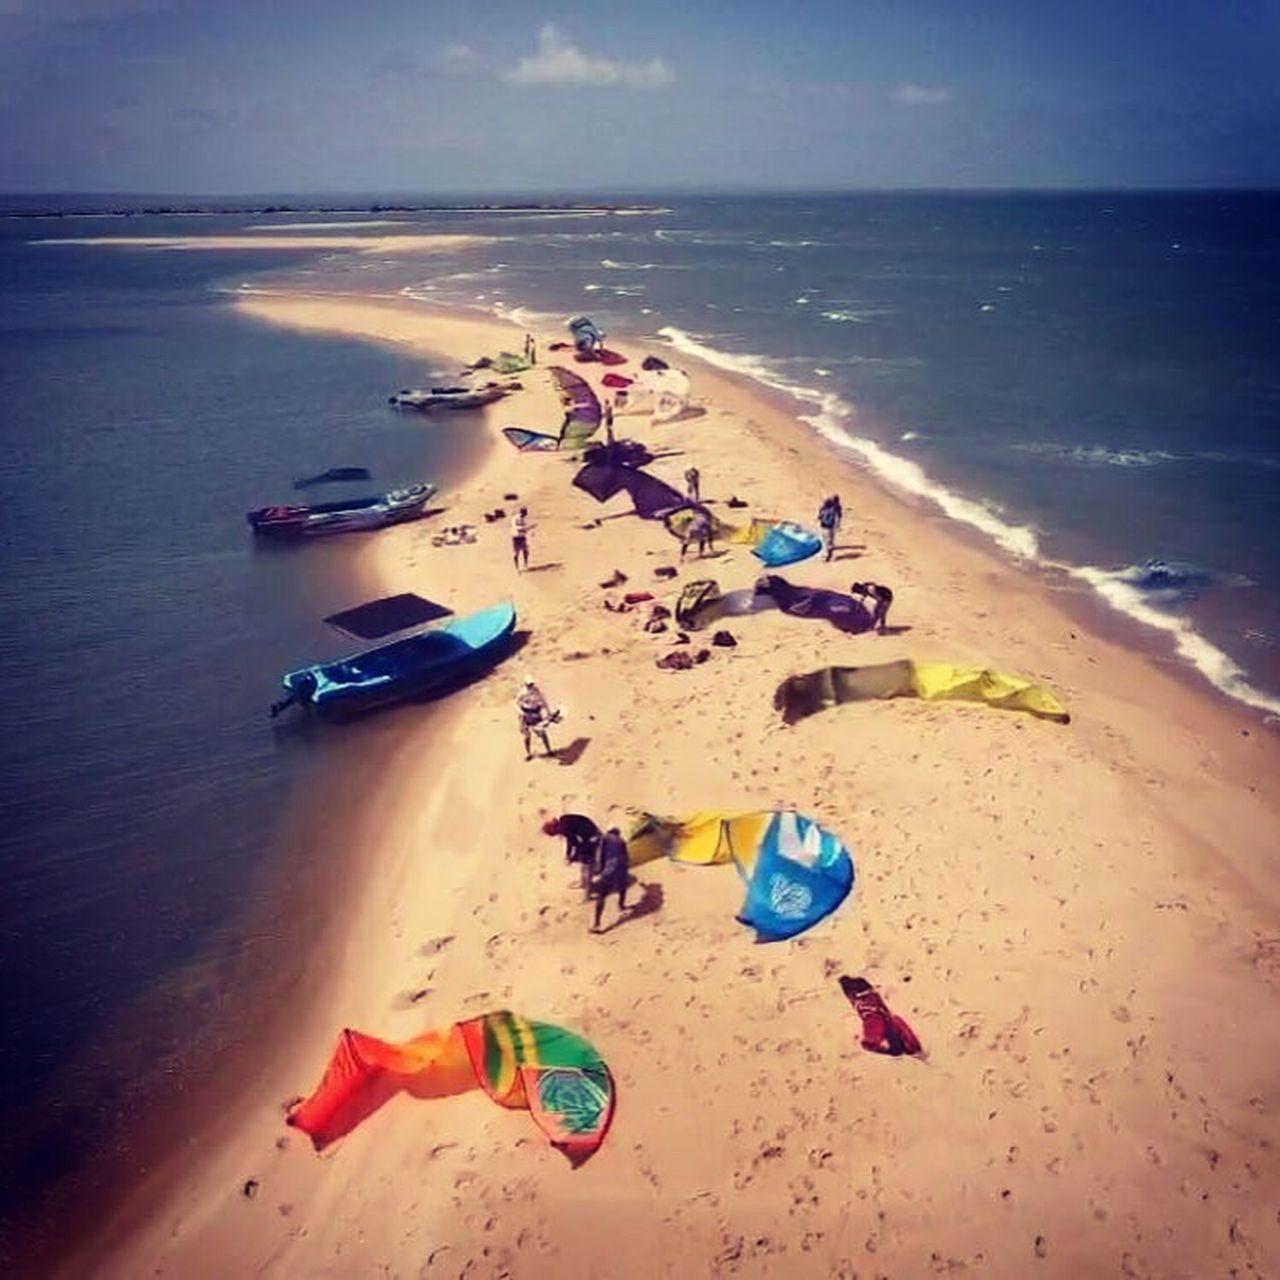 Kitesurfing Kiting Sri Lanka Adventure Ocean